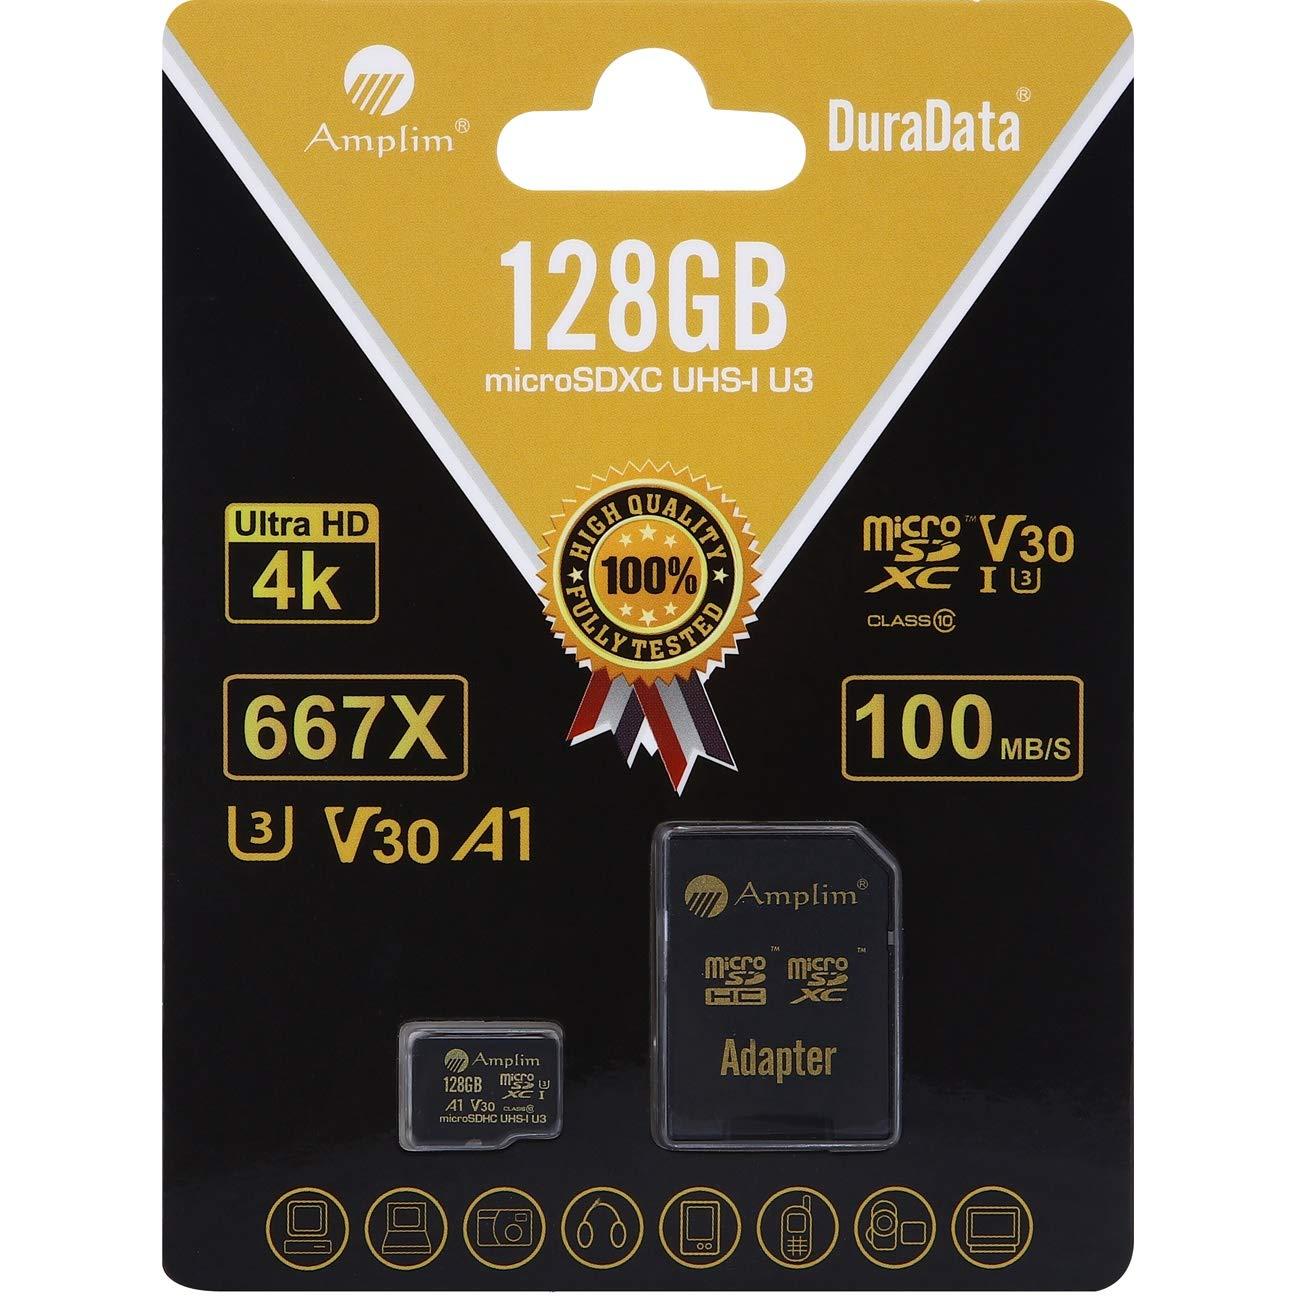 128GB Micro SD SDXC V30 A1 Memory Card Plus Adapter Pack (Class 10 U3 UHS-I Pro MicroSD XC) Amplim 128 GB Ultra High Speed 667X 100MB/s UHS-1 TF ...